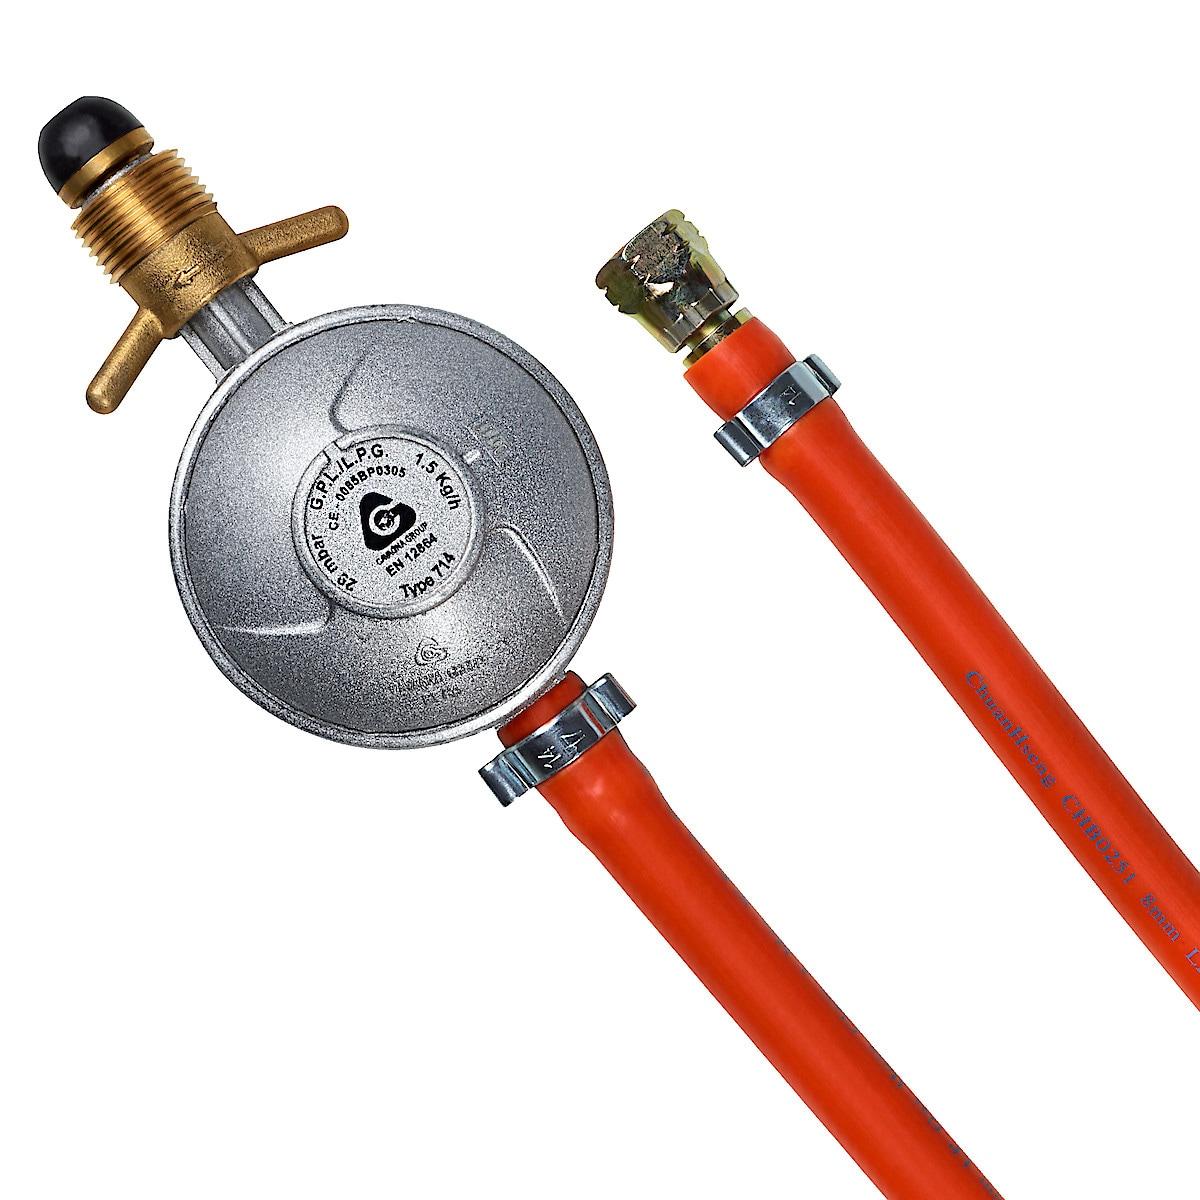 Gasolregulator Weber 8454